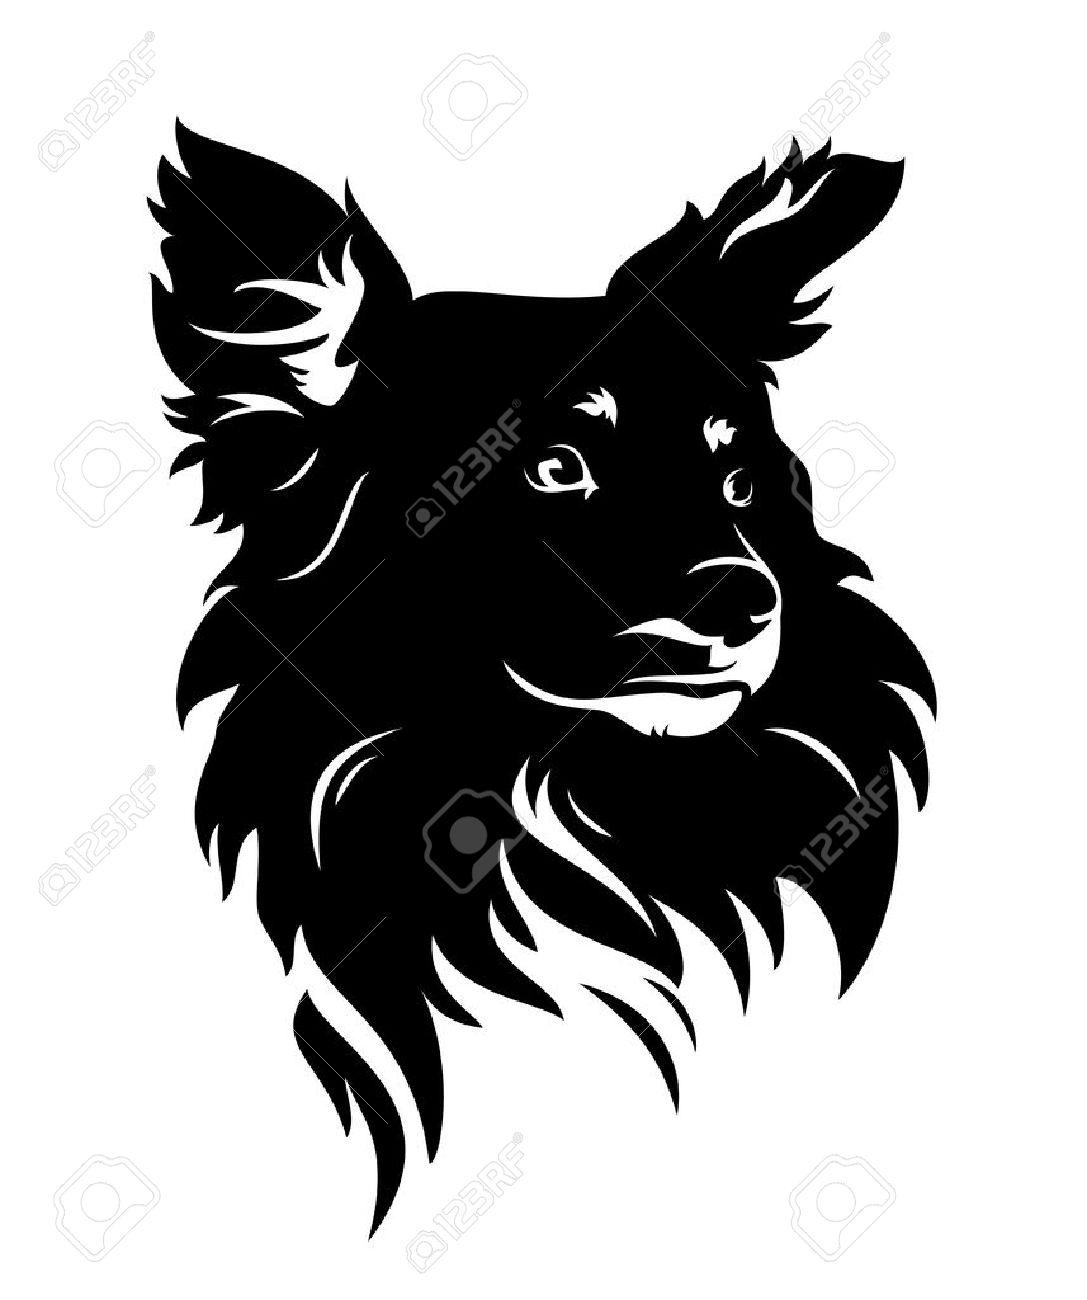 cute dog head - black and white puppy vector portrait - 38108106